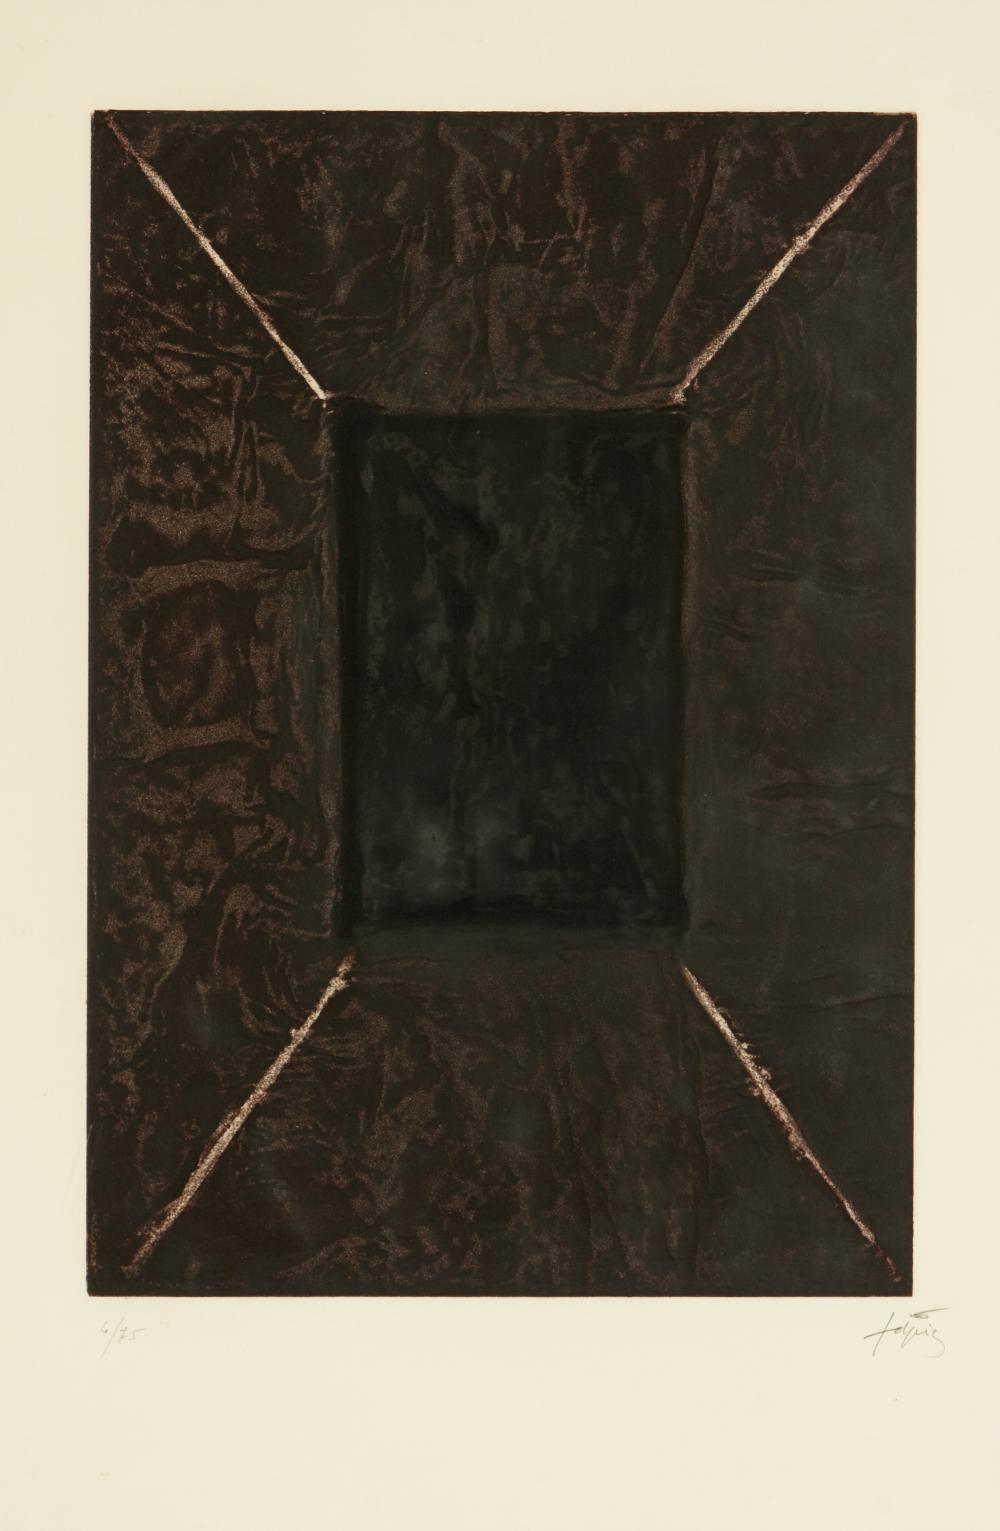 Antoni Tàpies (Spain 1923-2012) La Porte (The Door), 1969